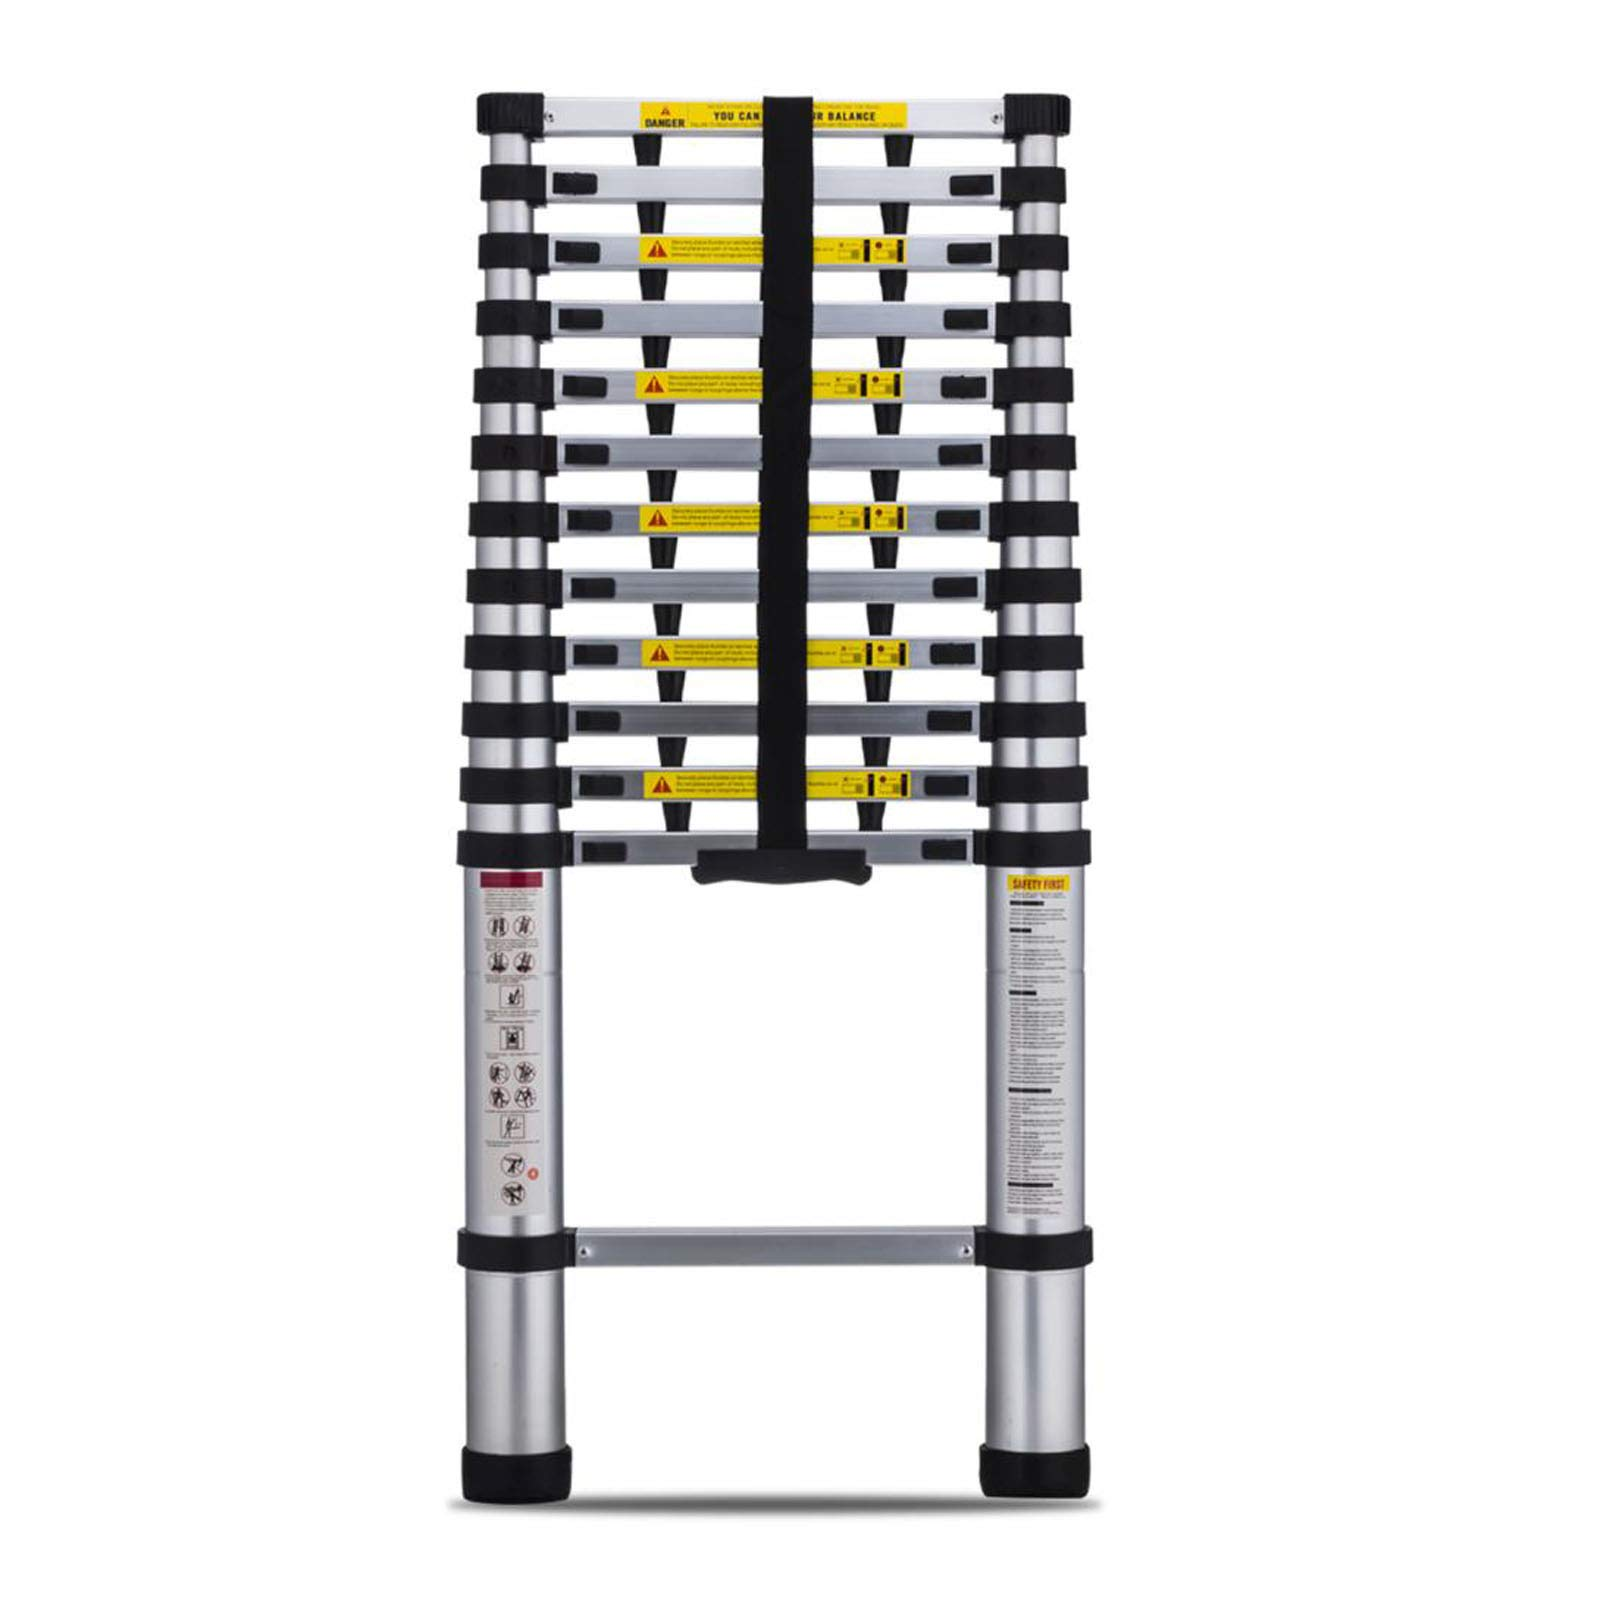 Superworth 12.5FT Aluminum Telescopic Extension Ladder, EN131 Certified, Professional Heavy-Duty Foldable Telescopic Extendable Step Ladder 330LBS Capacity